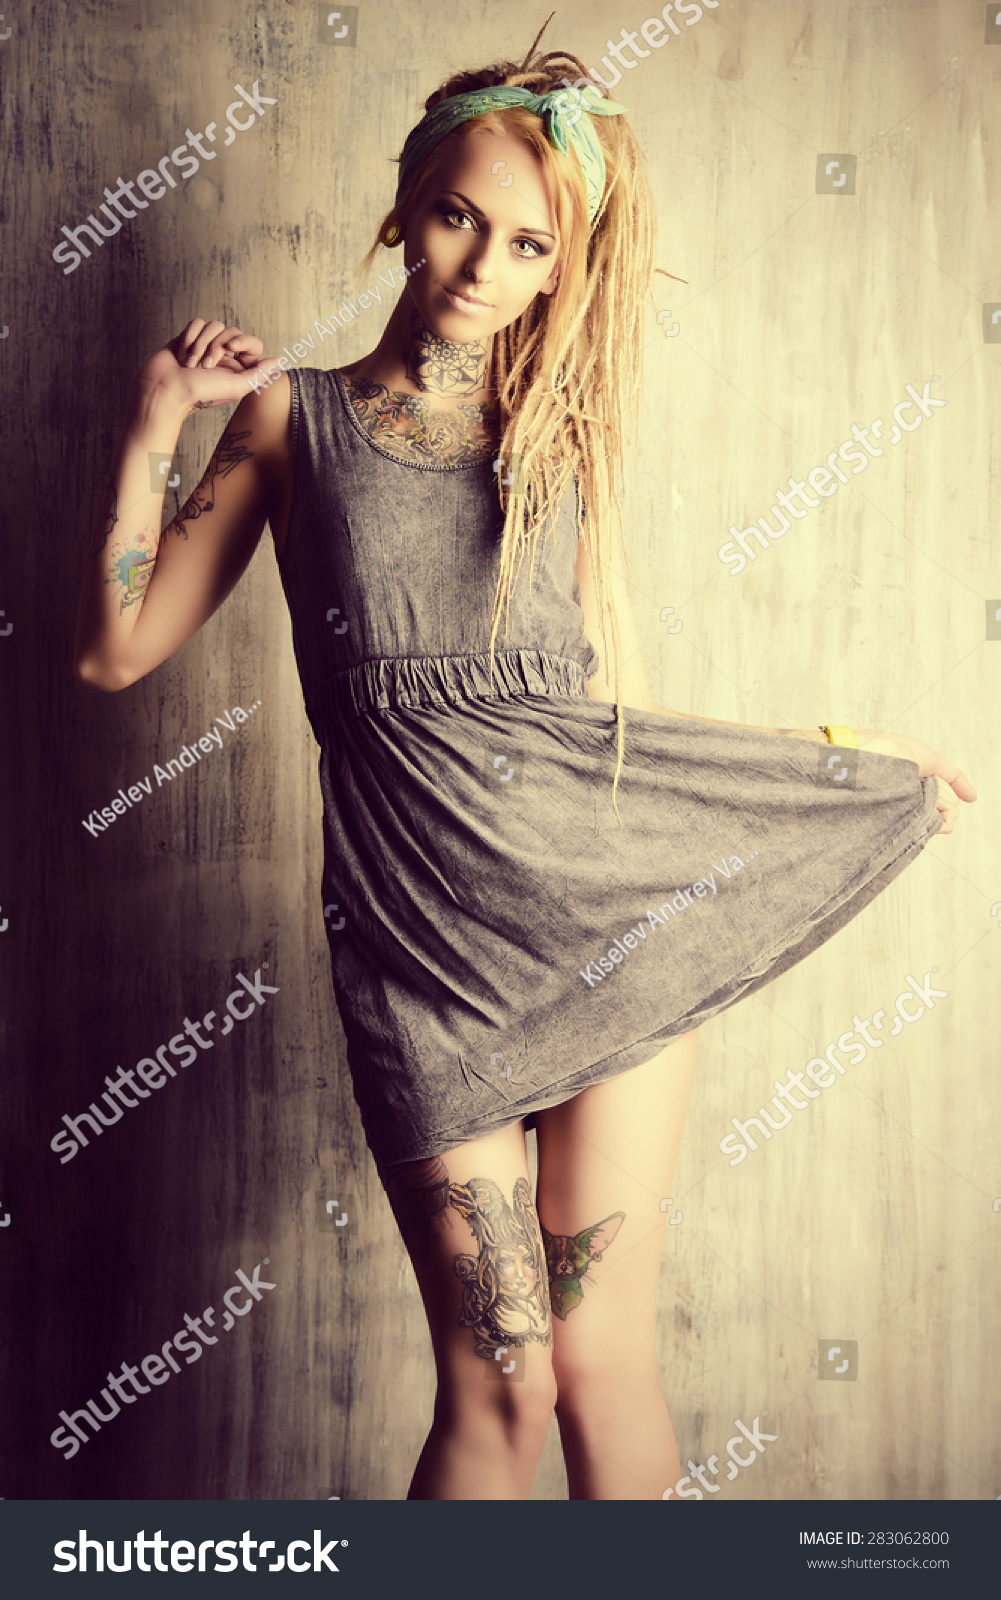 Sexual Blonde Girl Fascinating Dreadlocks Posing Stock Photo ...